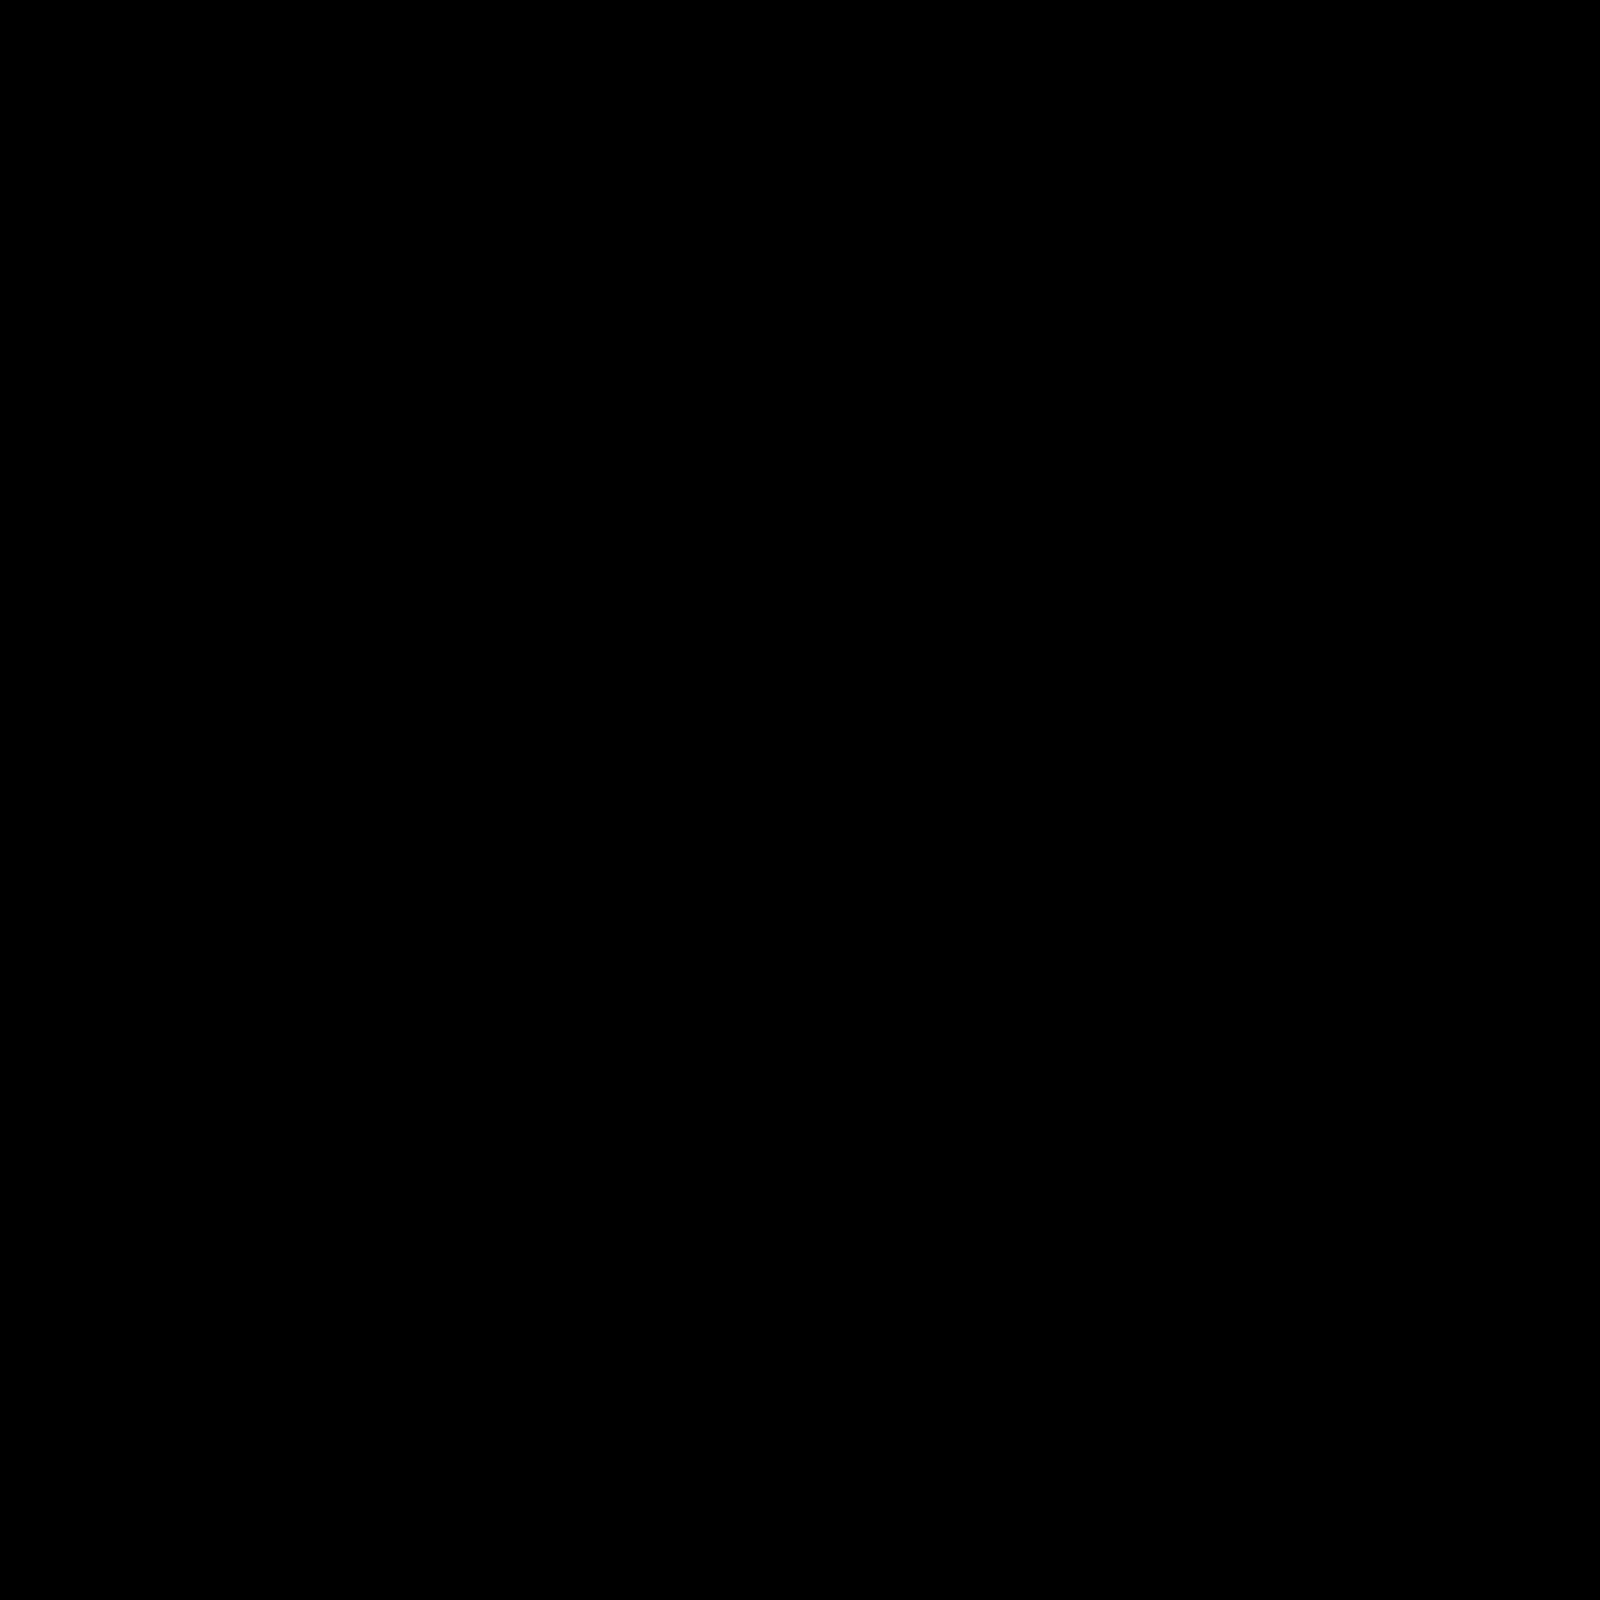 Межсетевой экран веб-приложений icon